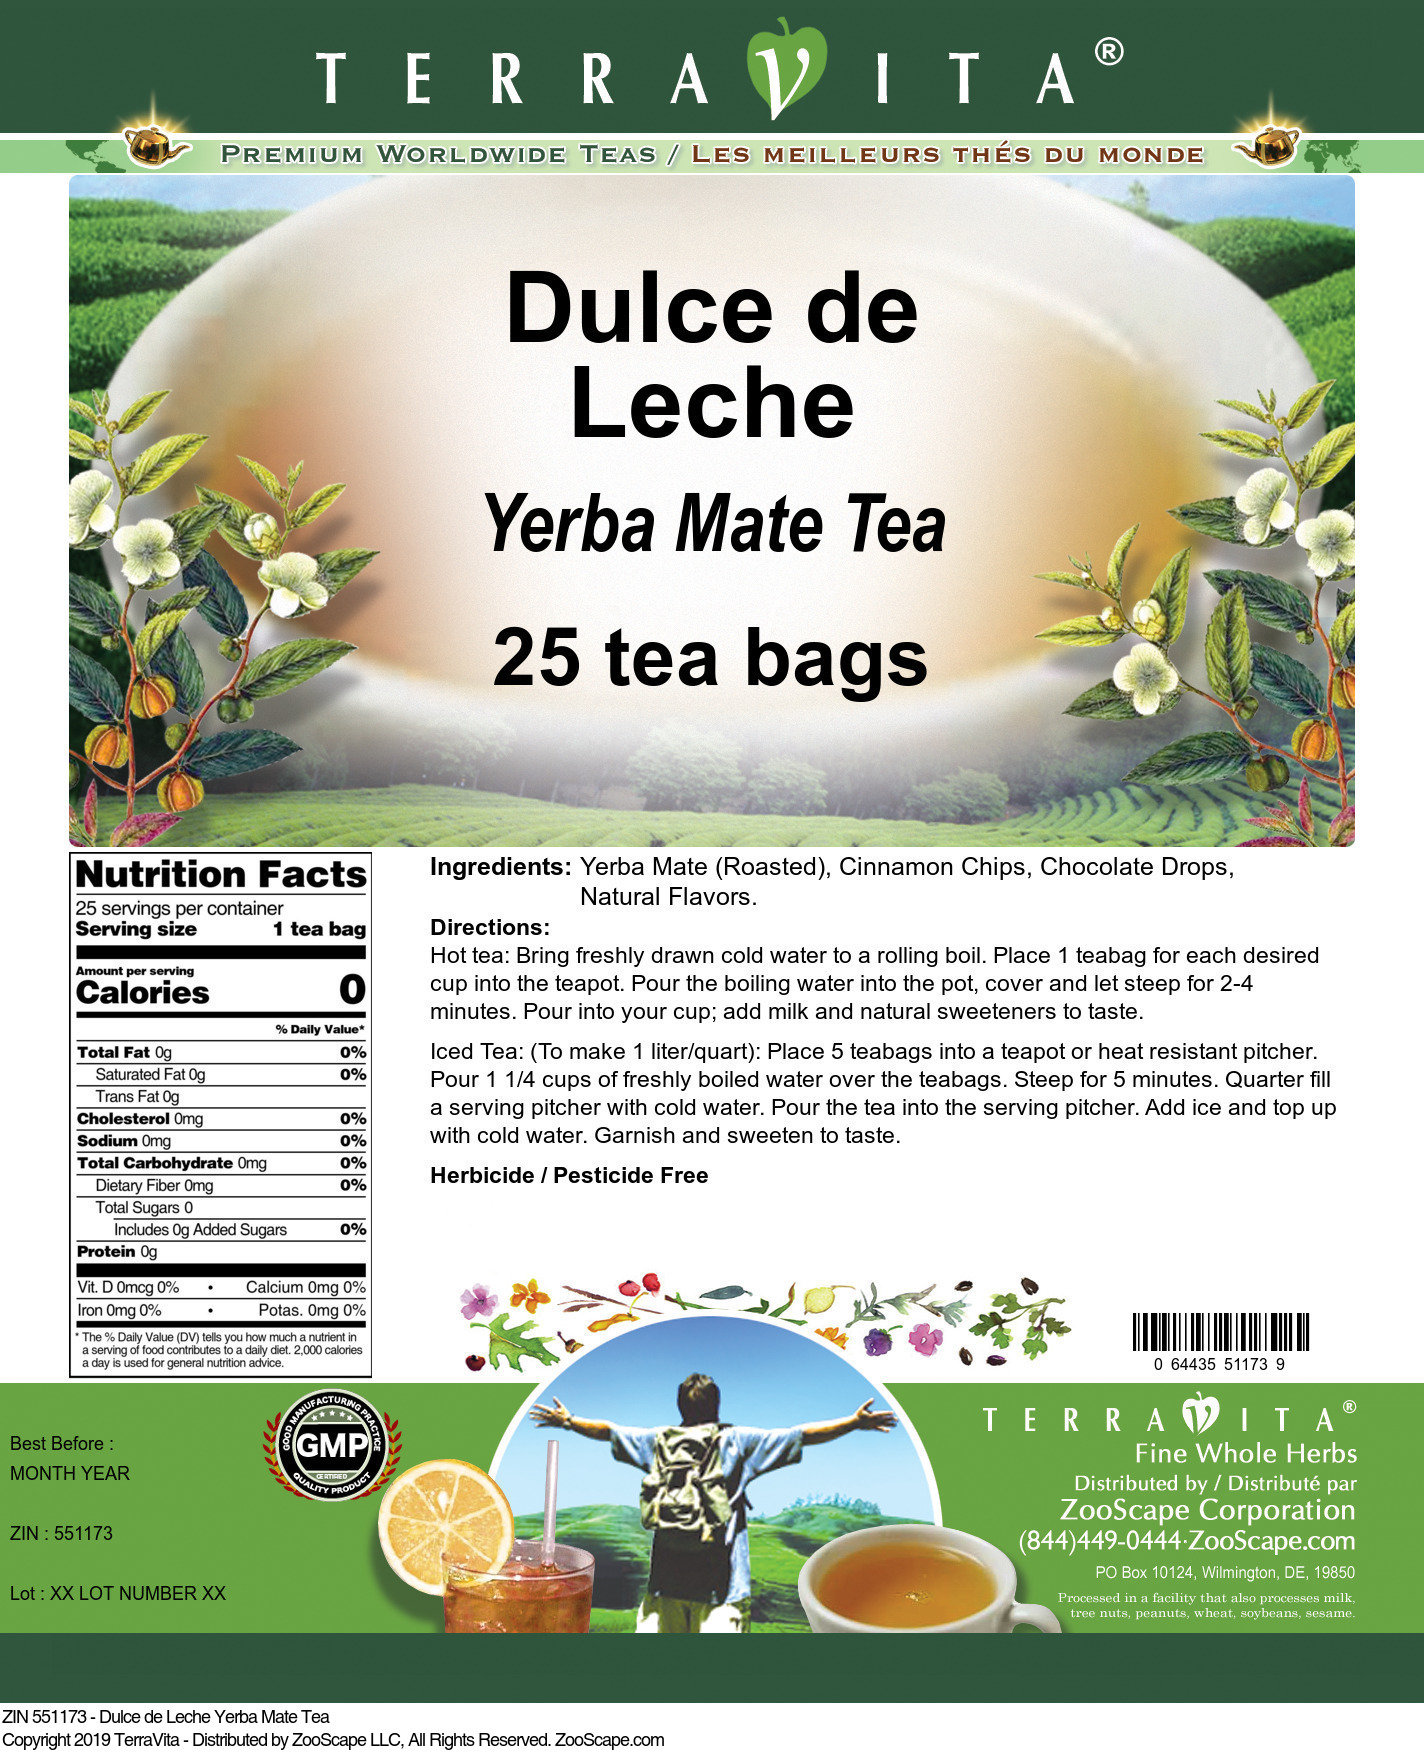 Dulce de Leche Yerba Mate Tea